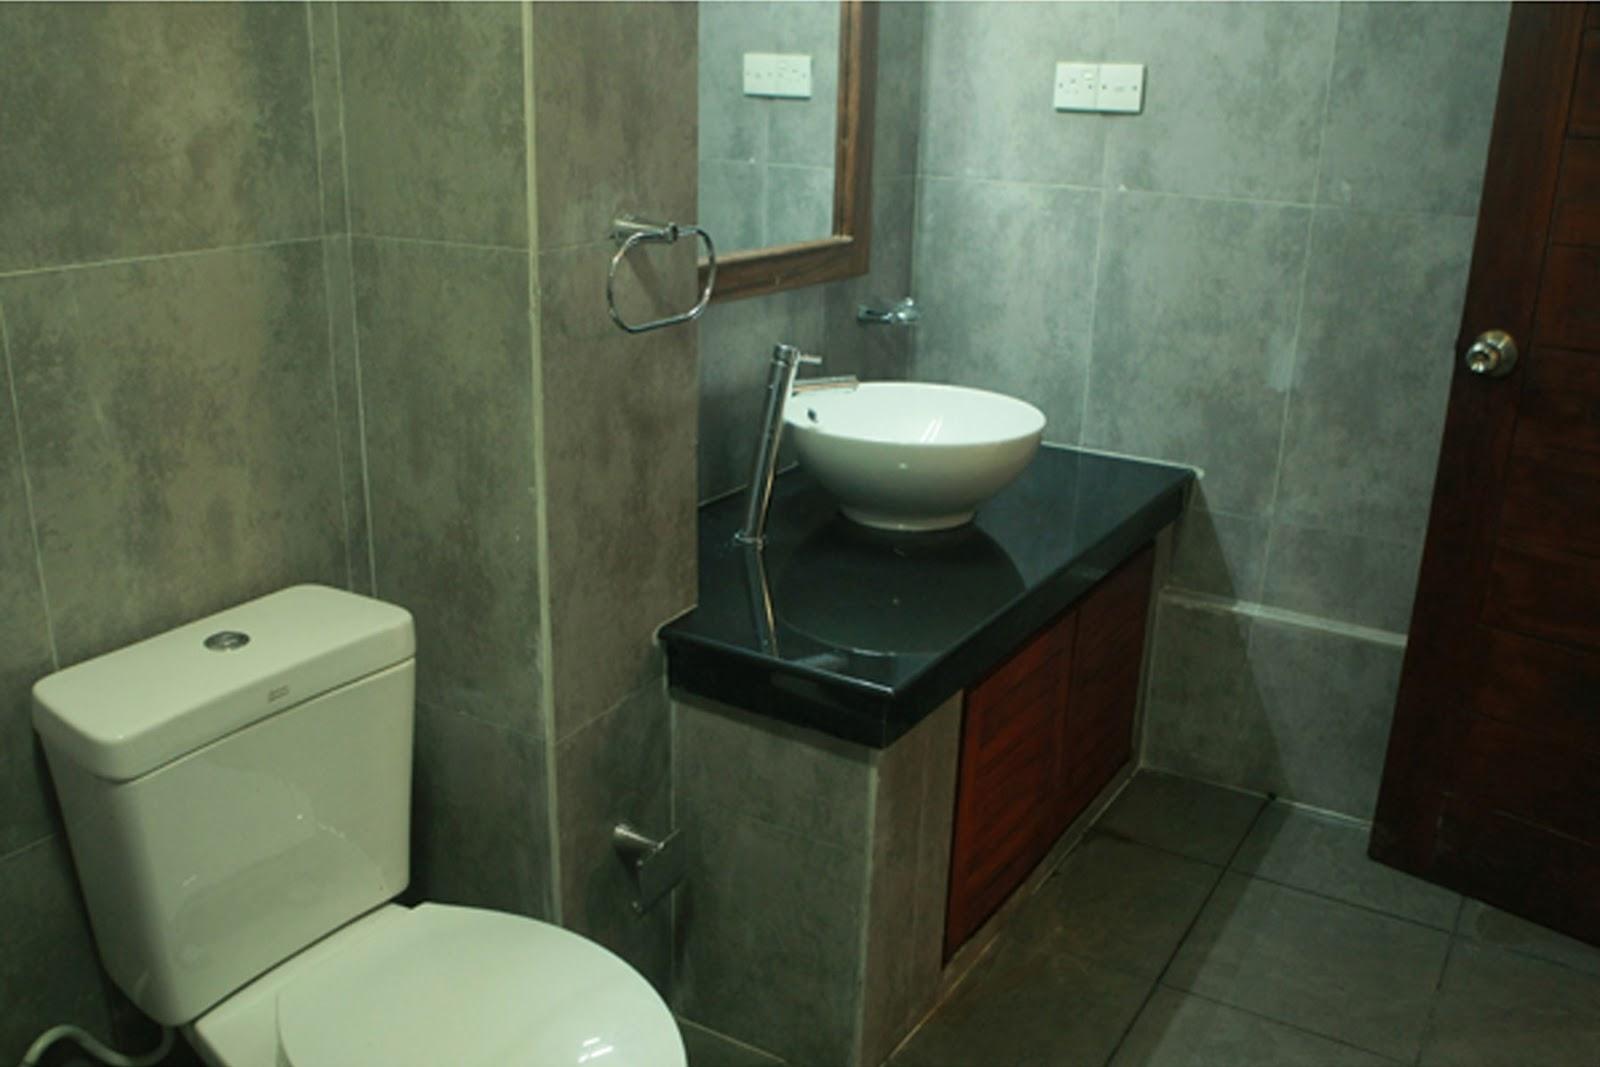 Vividasithuvili property sales in sri lanka 945 for Bathroom designs sri lanka